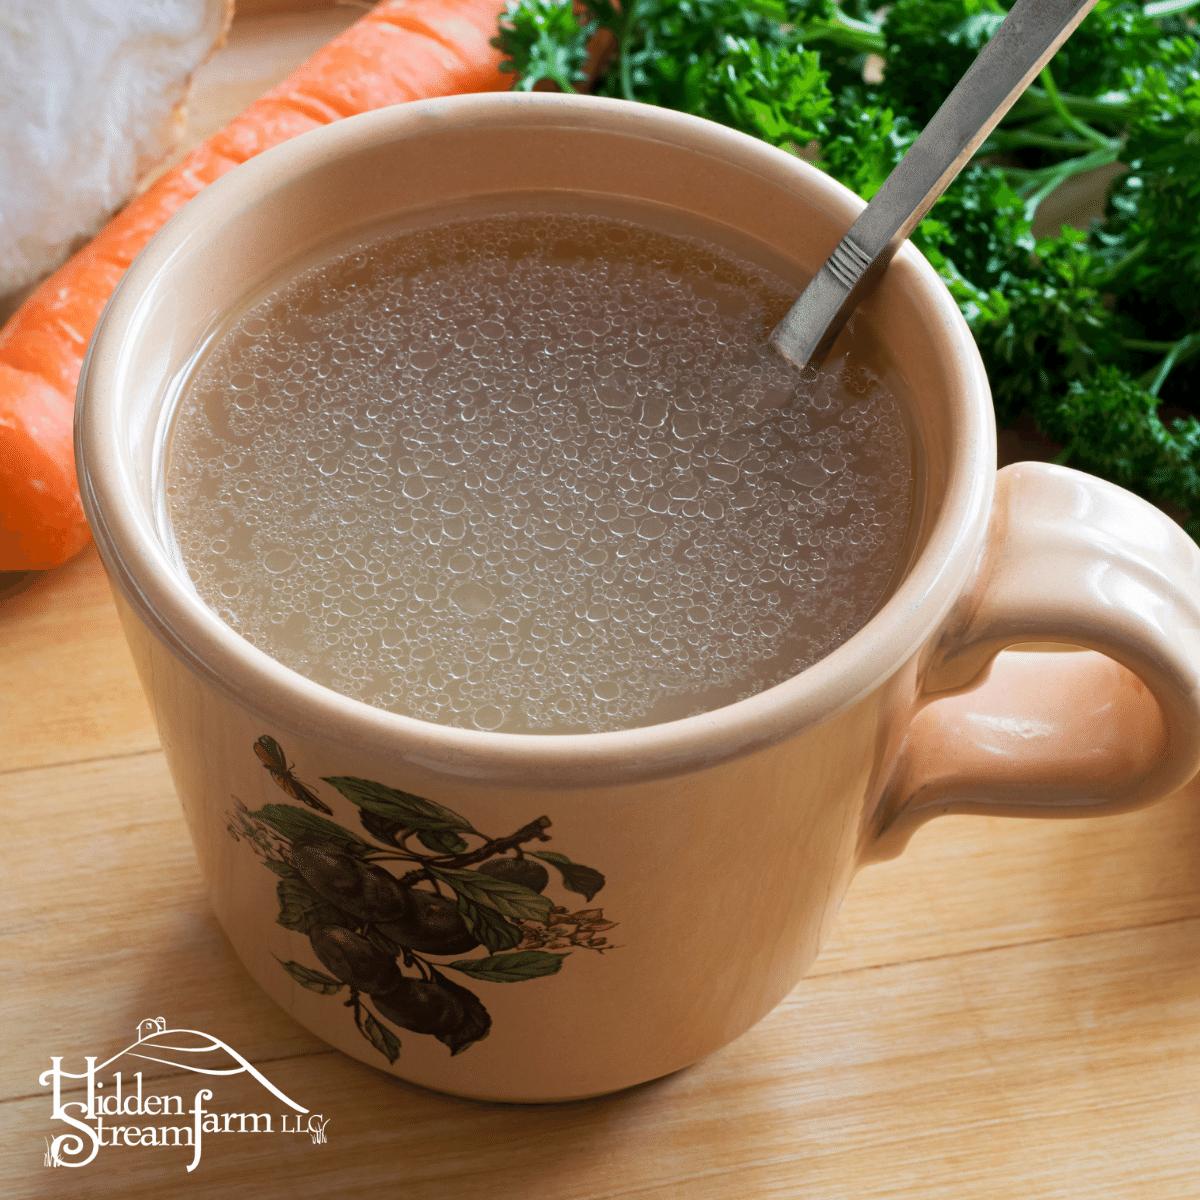 Grass-Fed Soup Bones for Broth